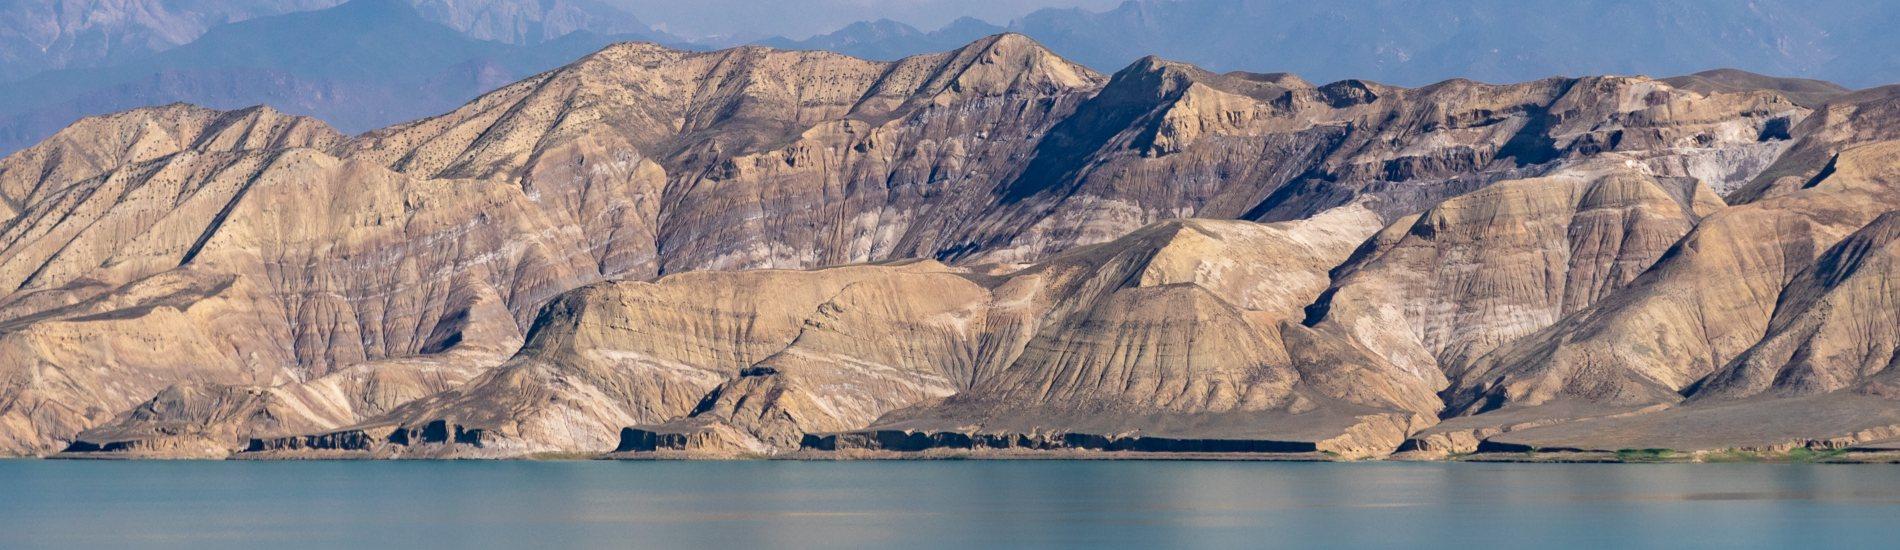 Baseline Assessment for the Identification of Landscape Restoration Options in Kyrgyzstan